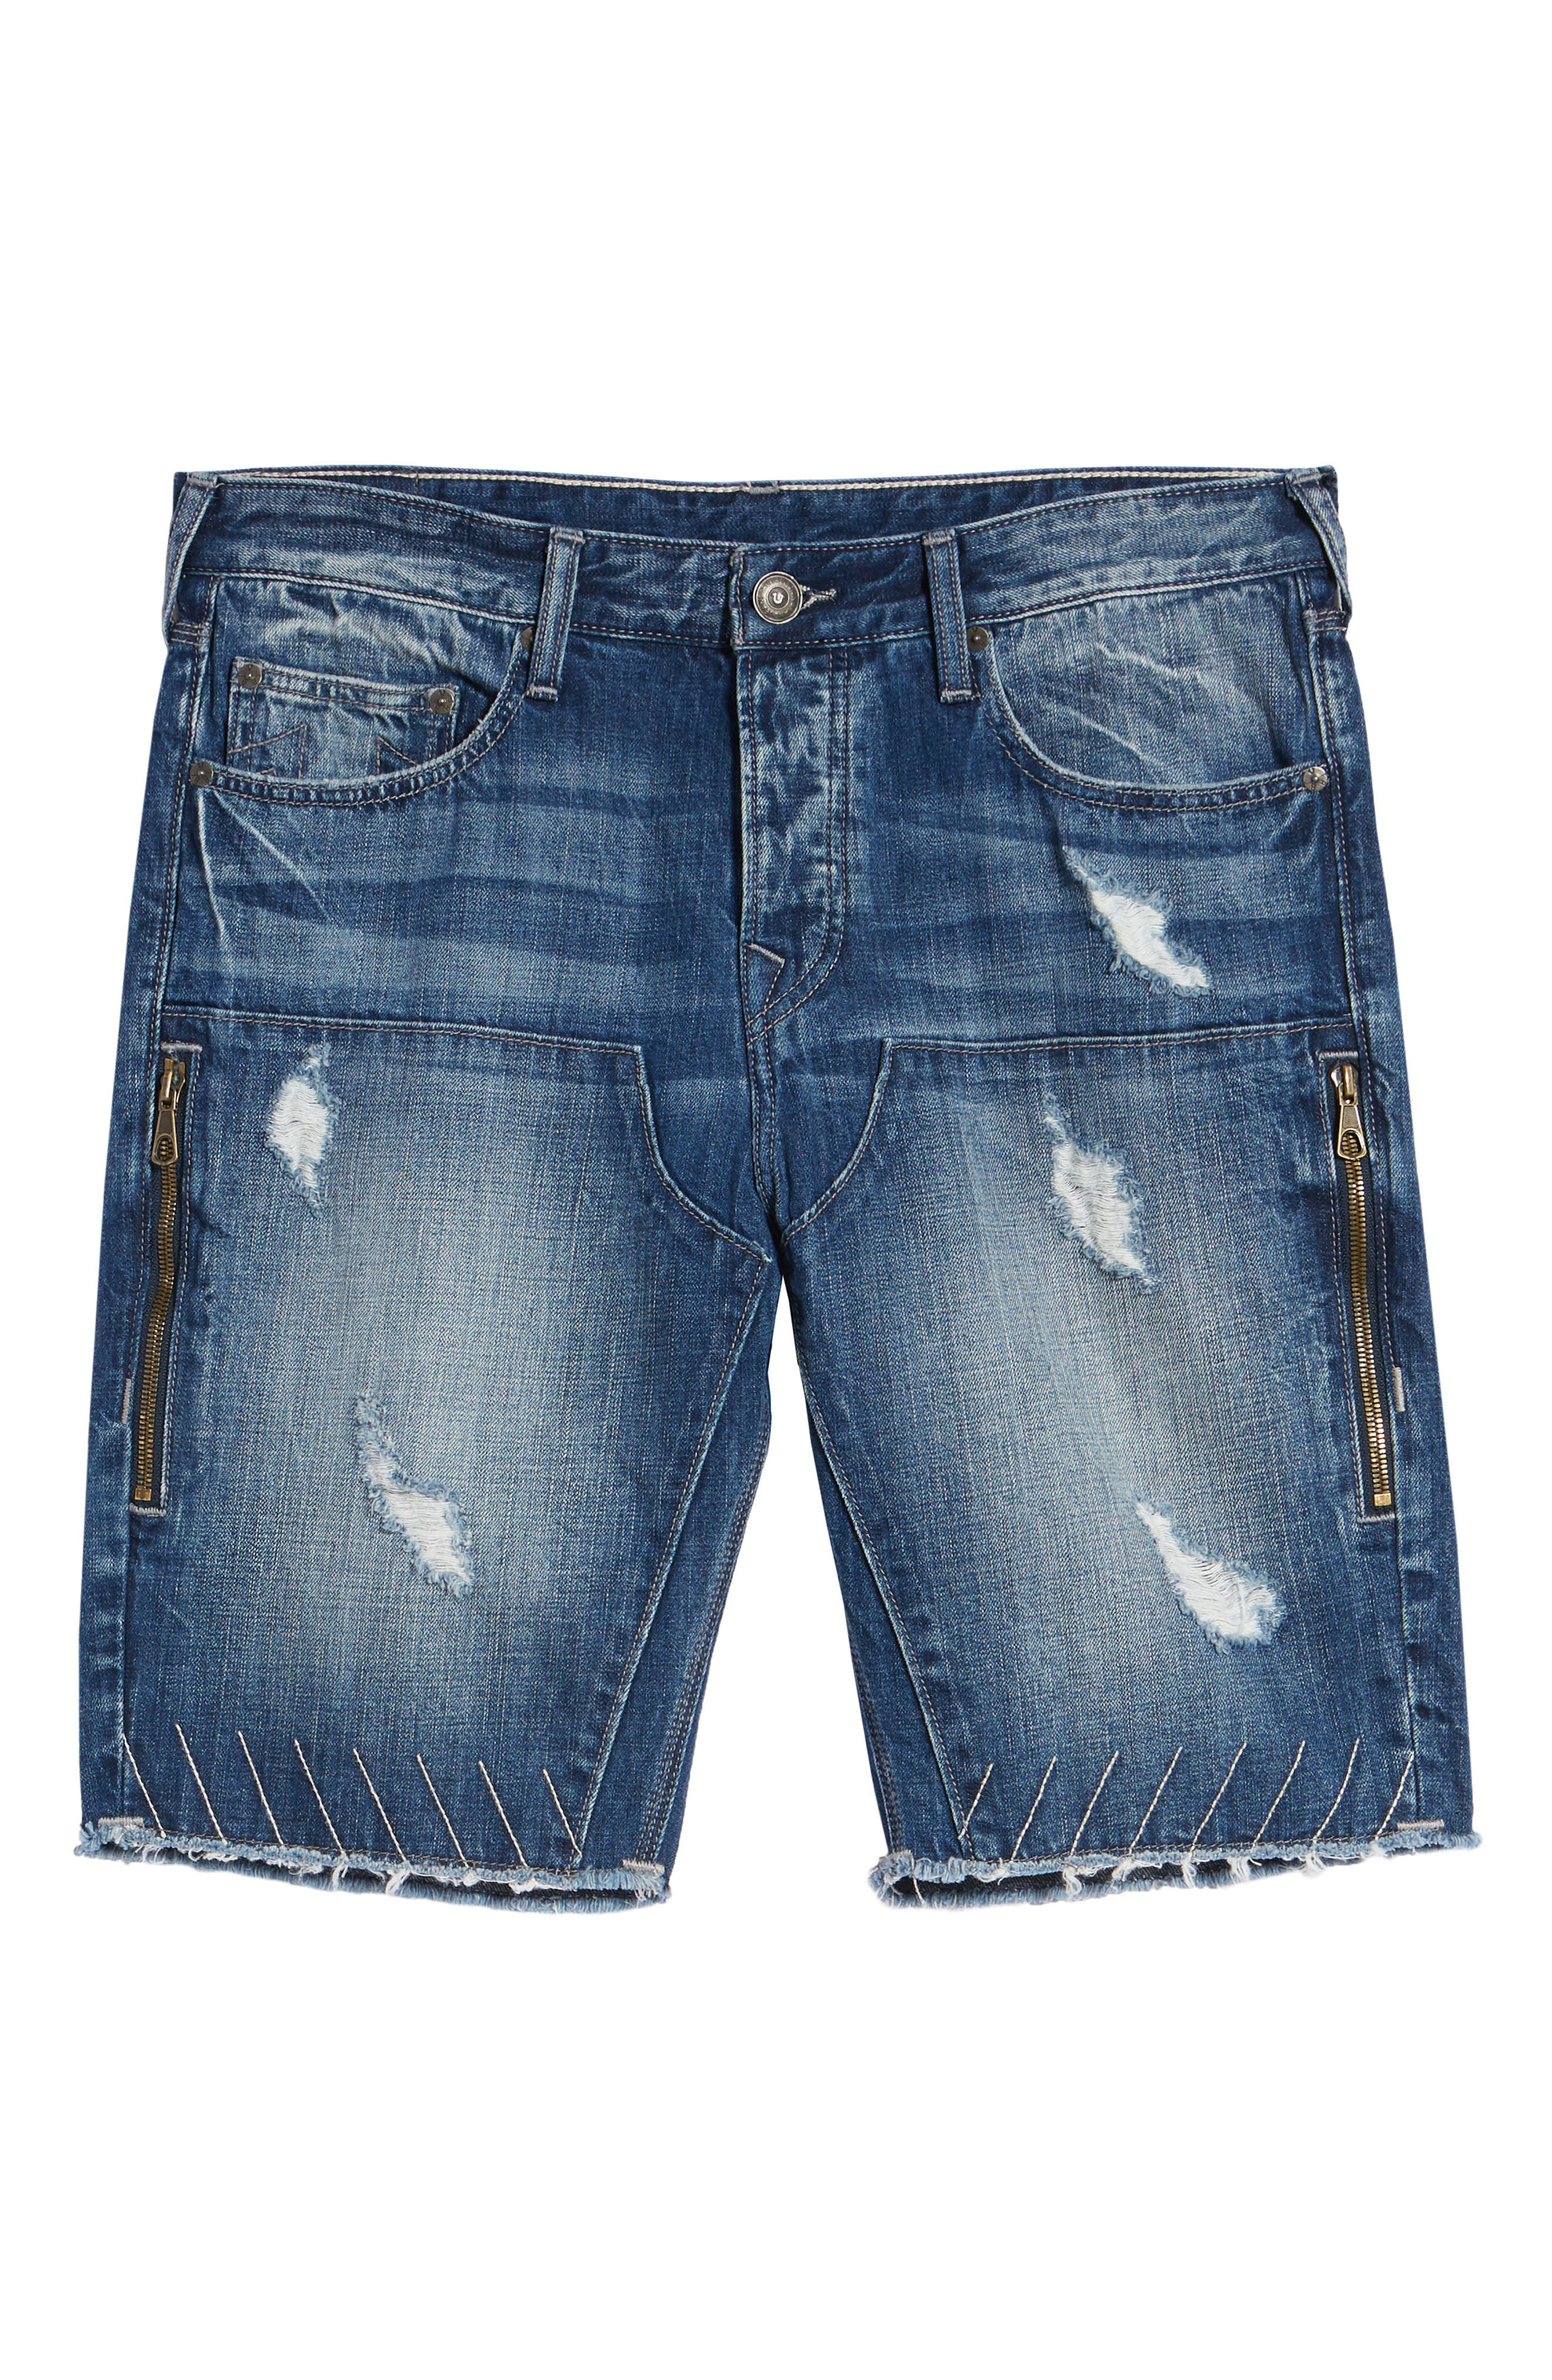 Field Shorts,                             Alternate thumbnail 6, color,                             Worn Glen